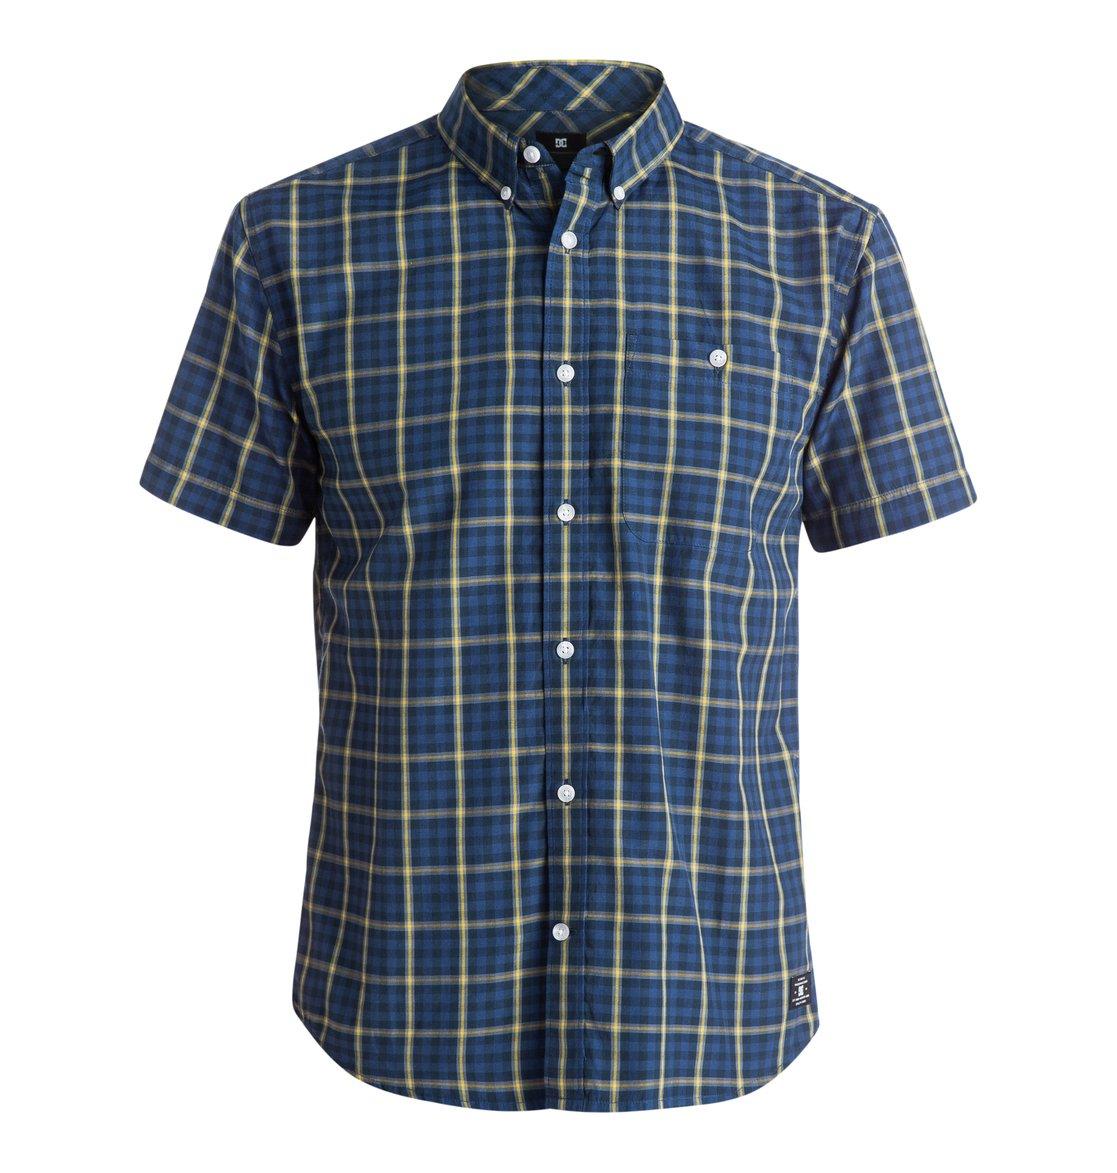 Atura 2 Short Sleeve Shirt от DC Shoes